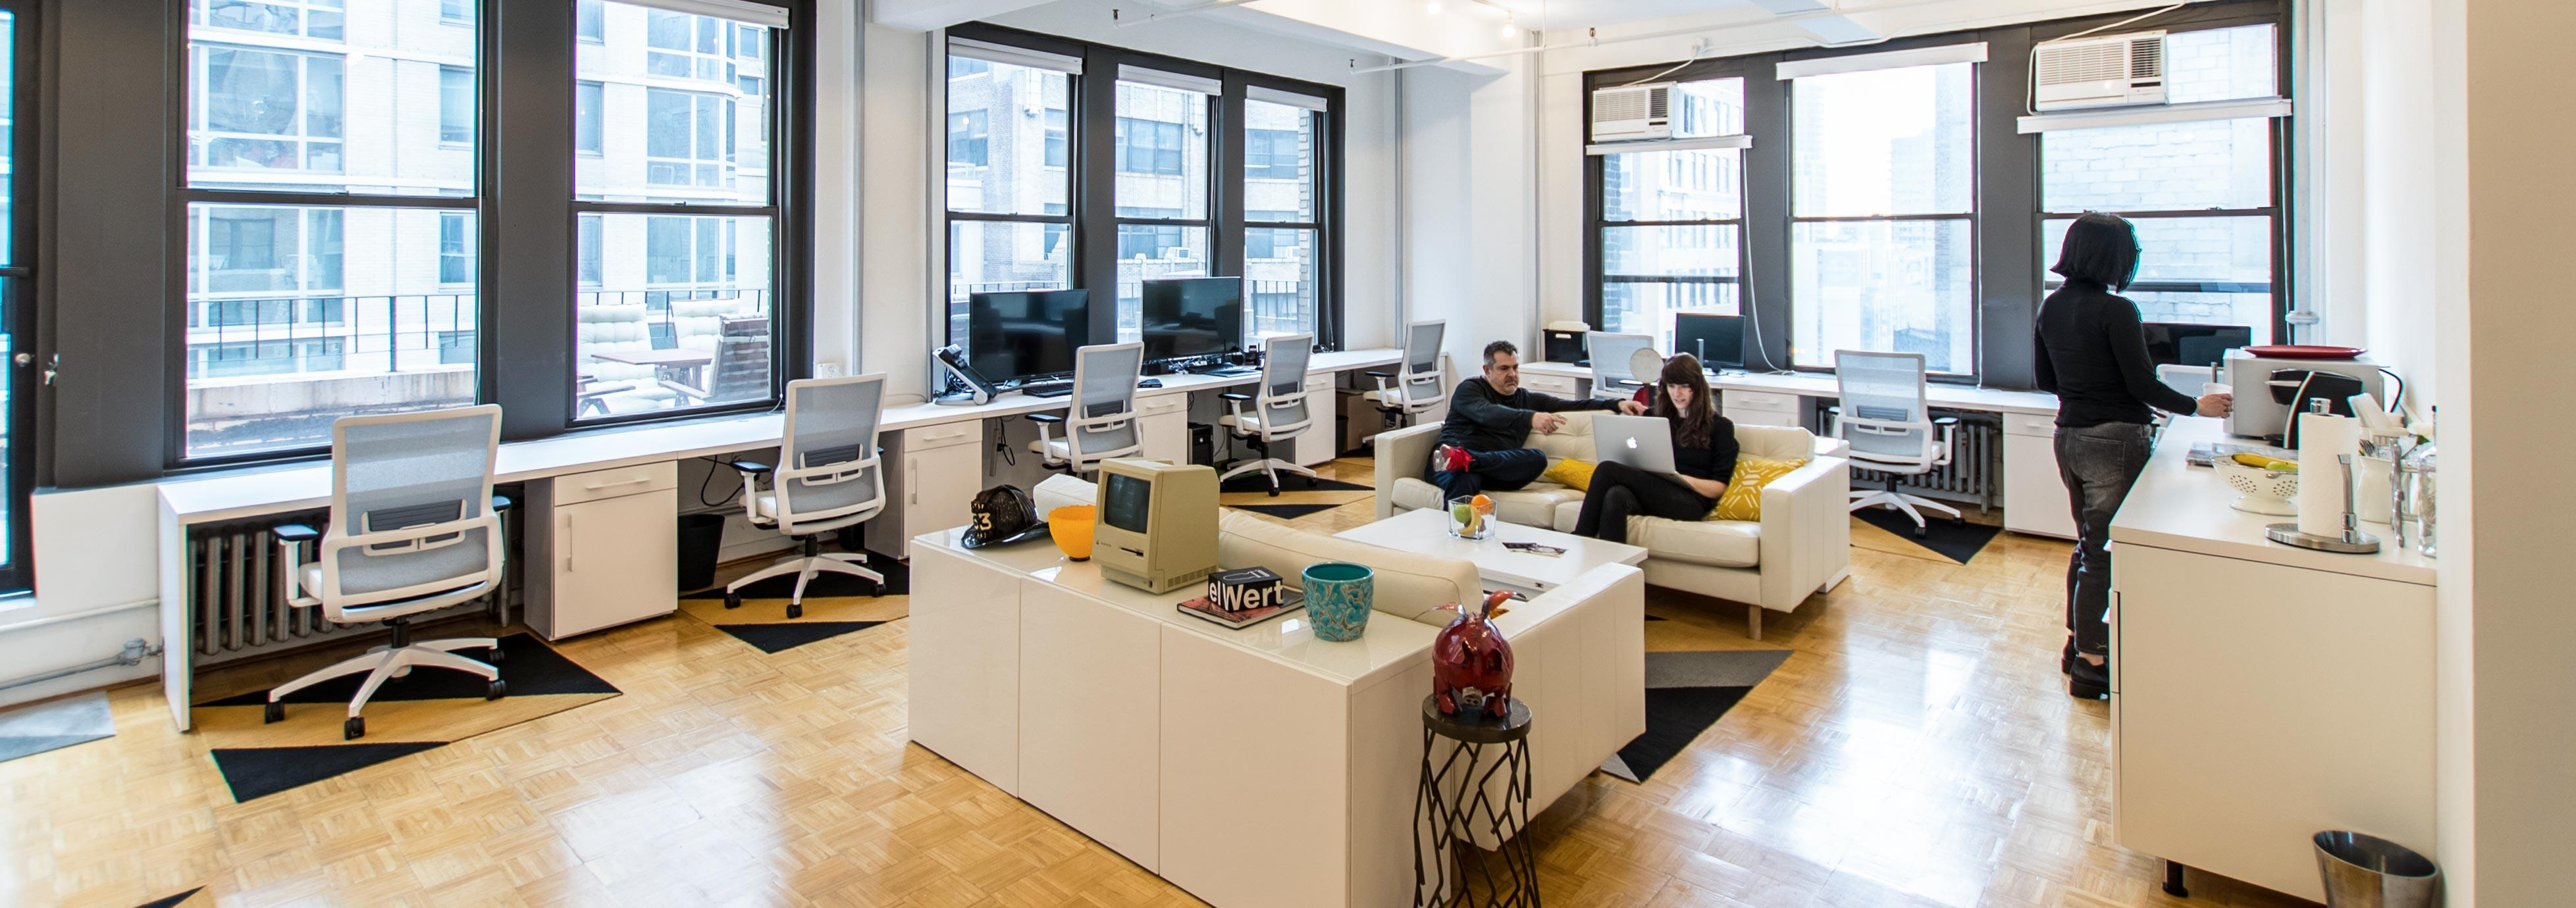 Loft Office Share in Midtown Manhattan - Dedicated Desk Better/Cheaper thn WeWork